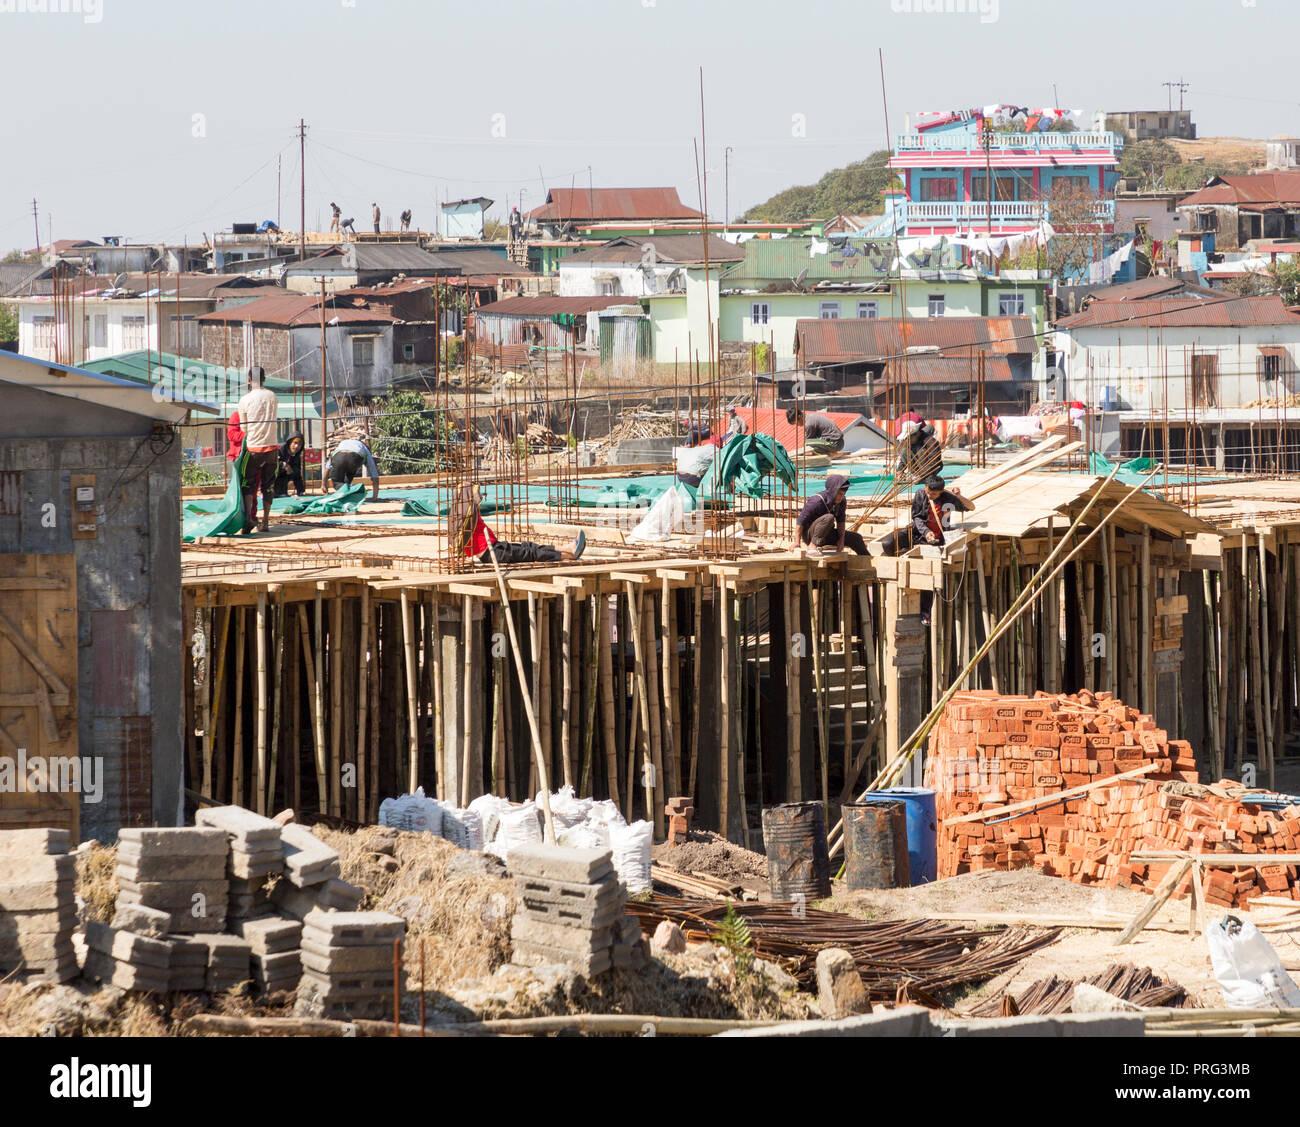 Building construction using bamboo scaffolding supports, Mawsynram, Meghalaya, India - Stock Image